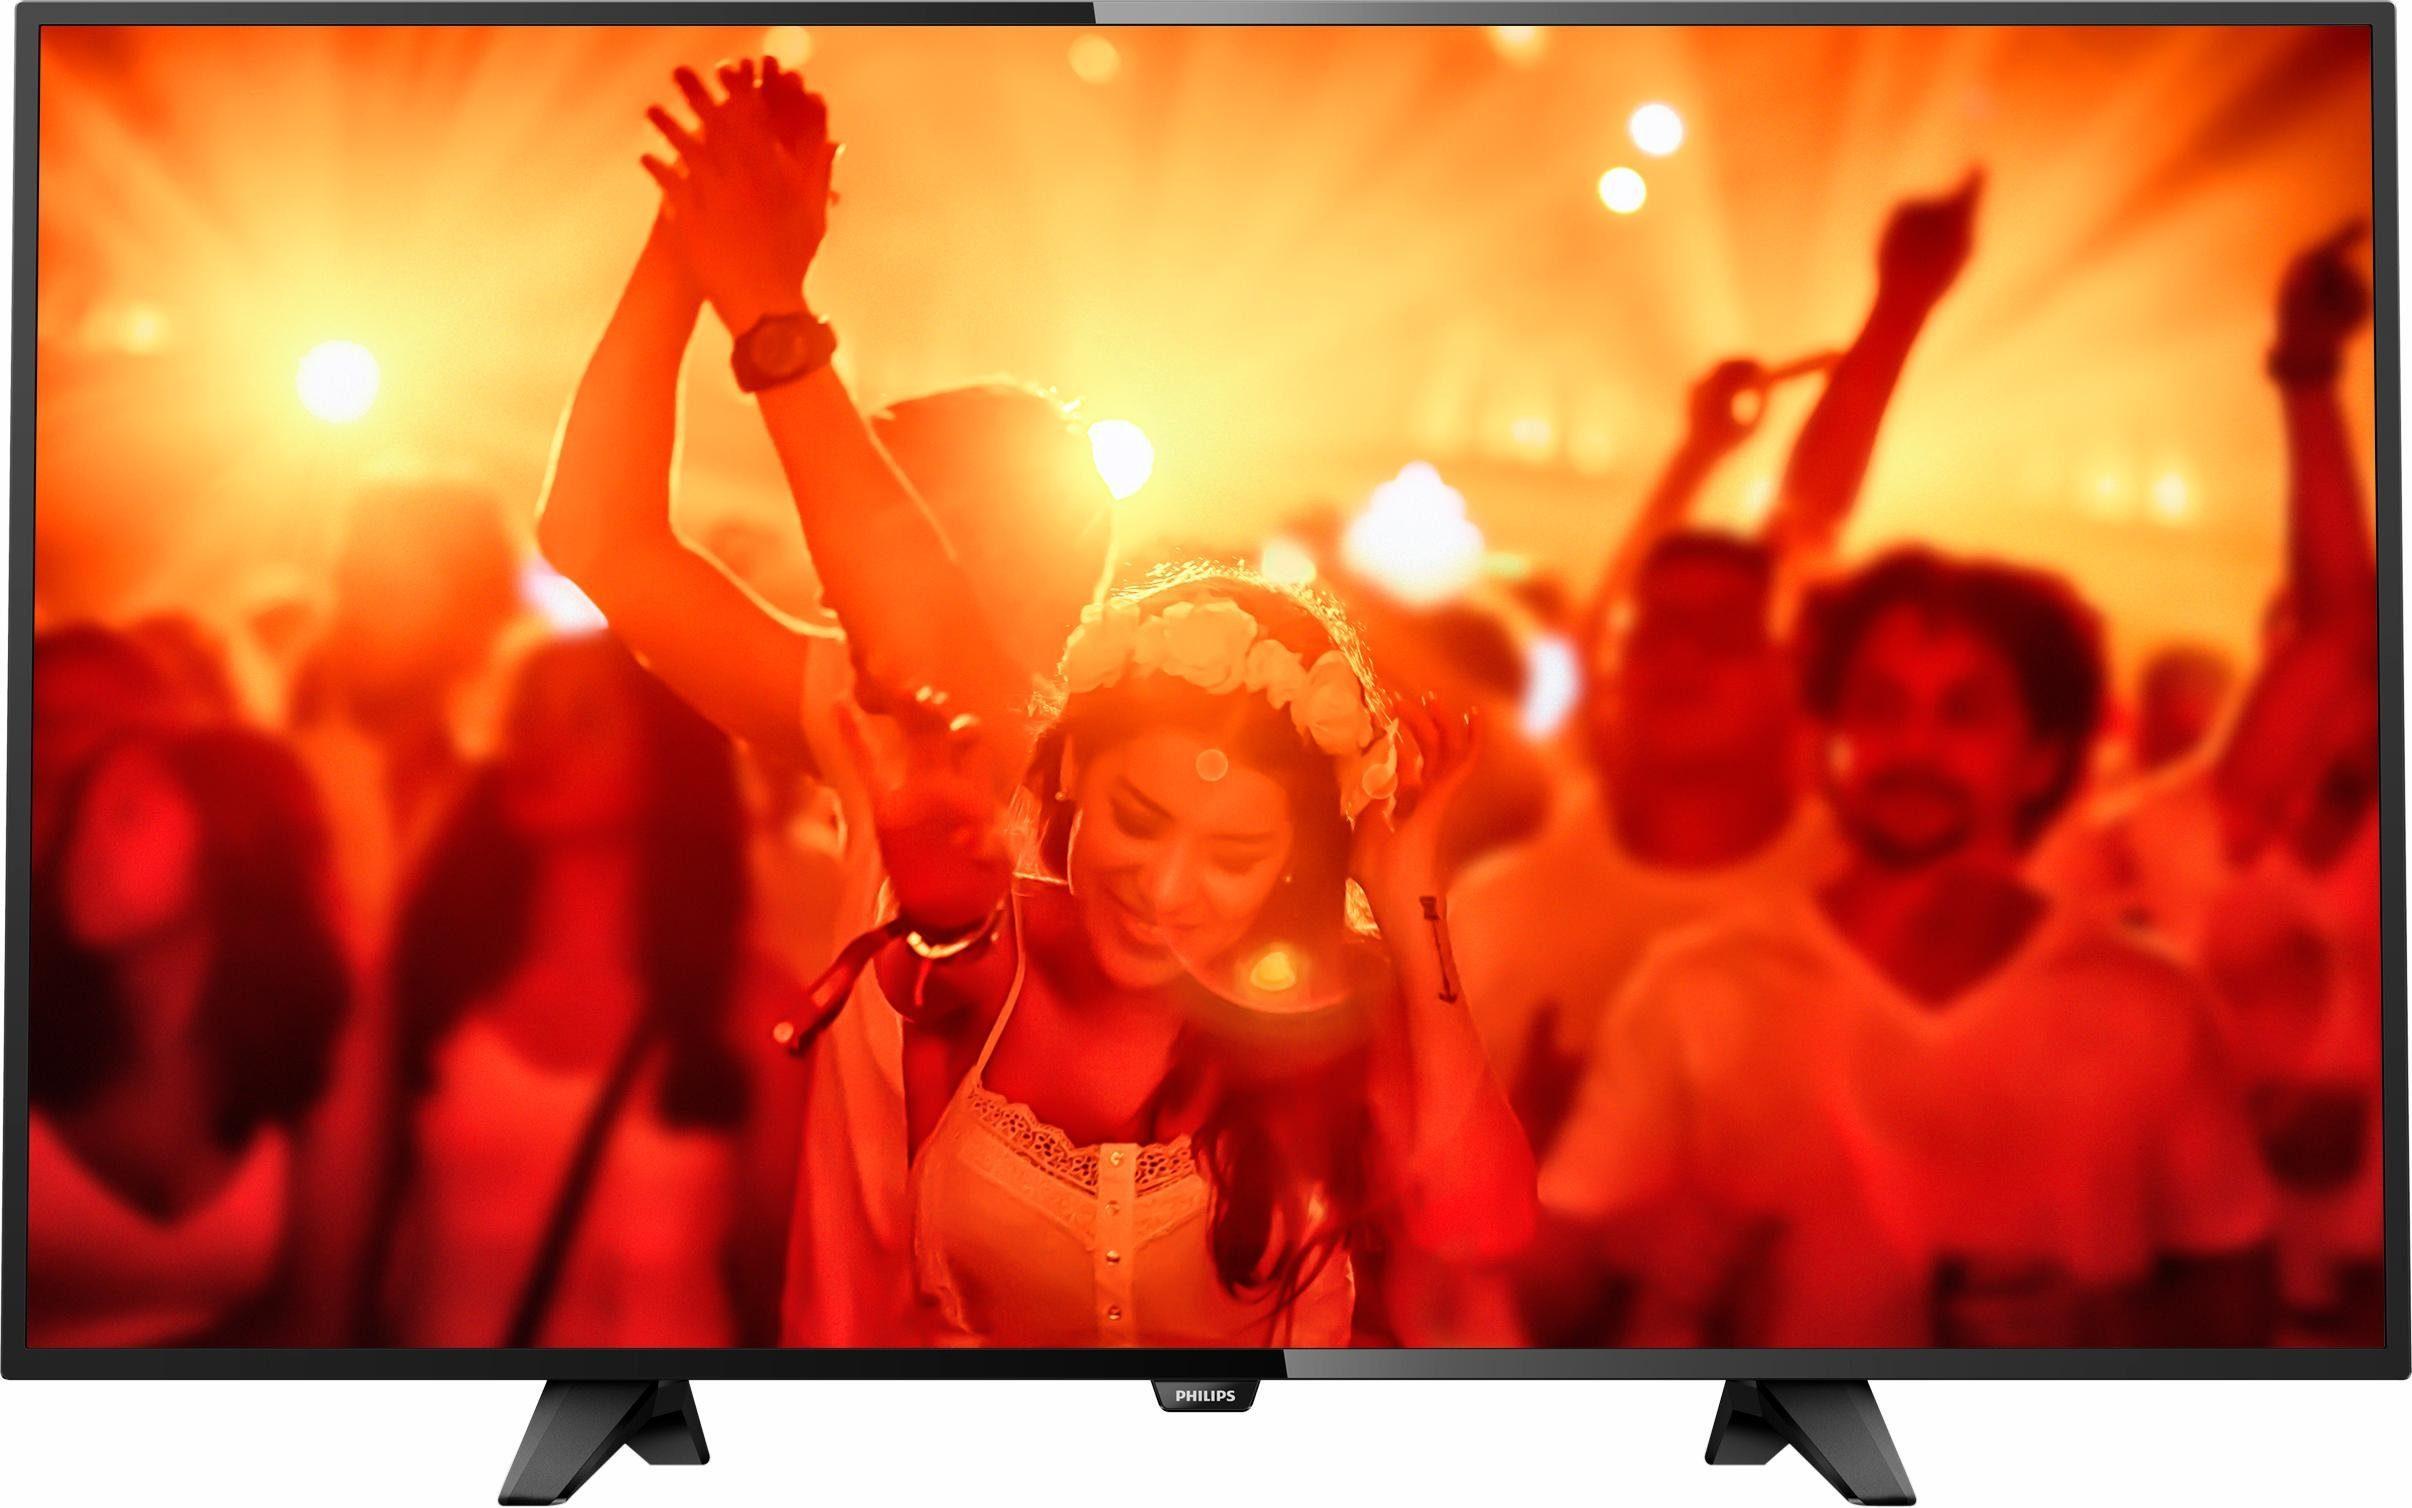 Philips 43PFS4131, LED Fernseher, 108 cm (43 Zoll), 1080p (Full HD)